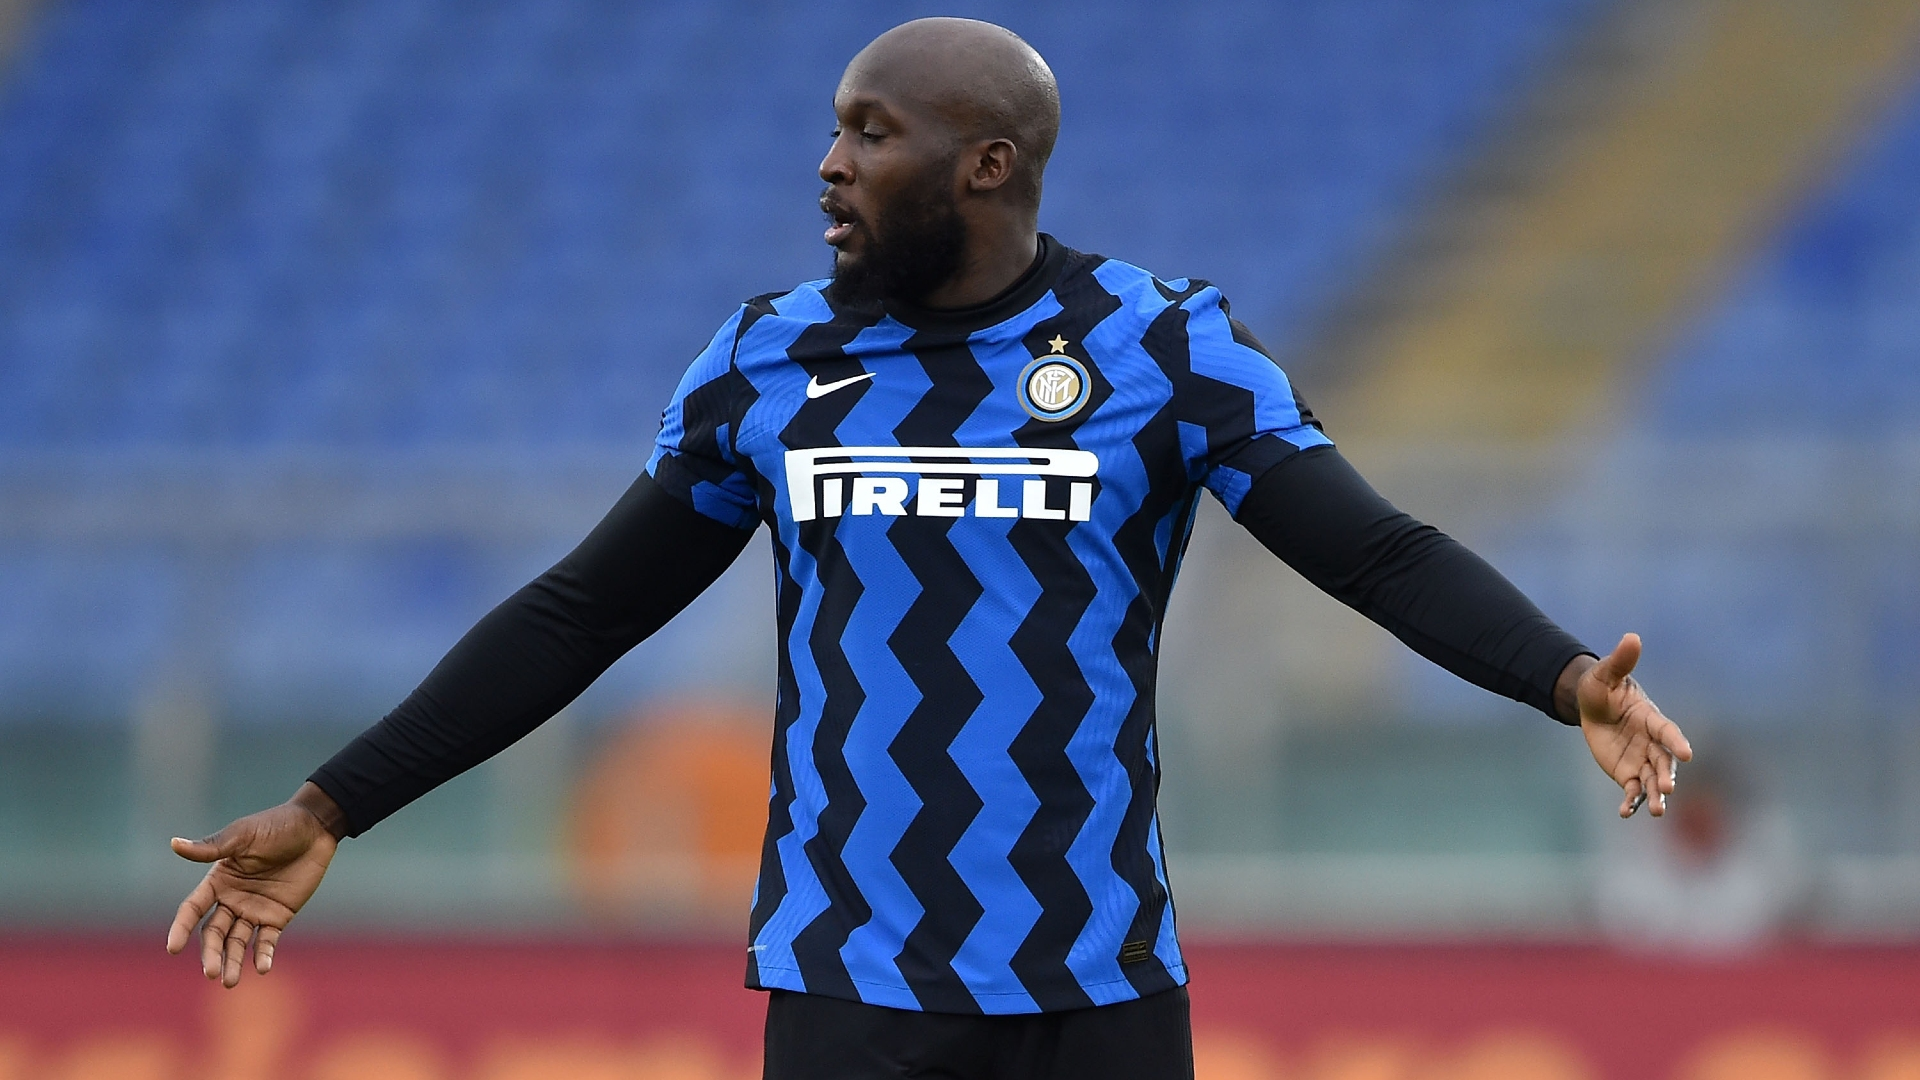 Lukaku has power like Shaquille O'Neal – Barella amazed by Inter striker